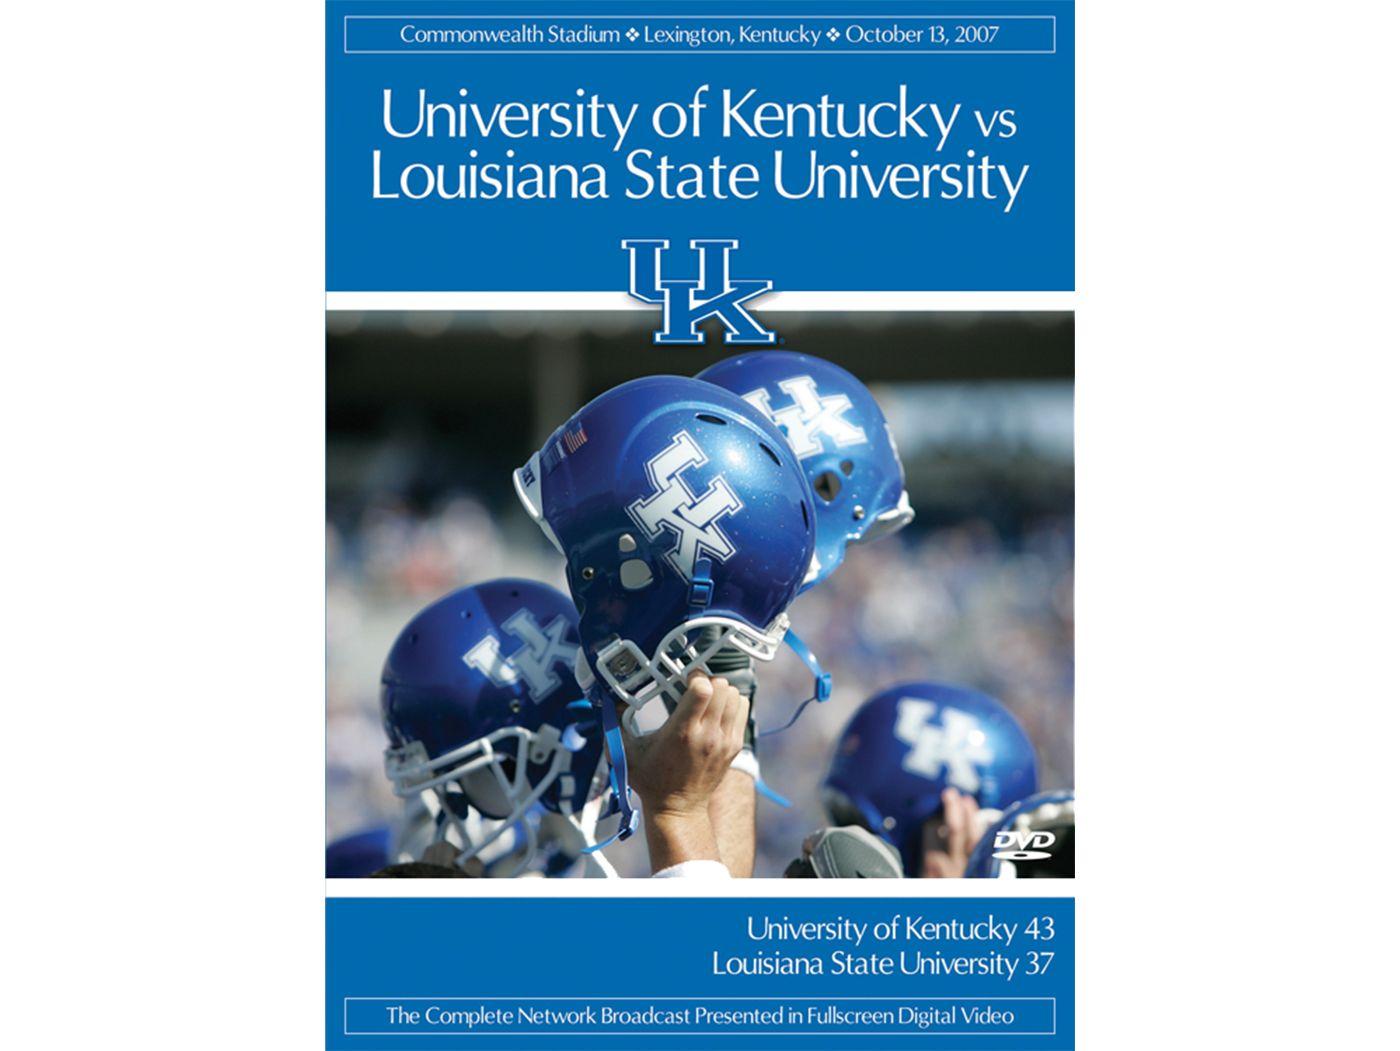 2007 Kentucky vs. LSU Game DVD